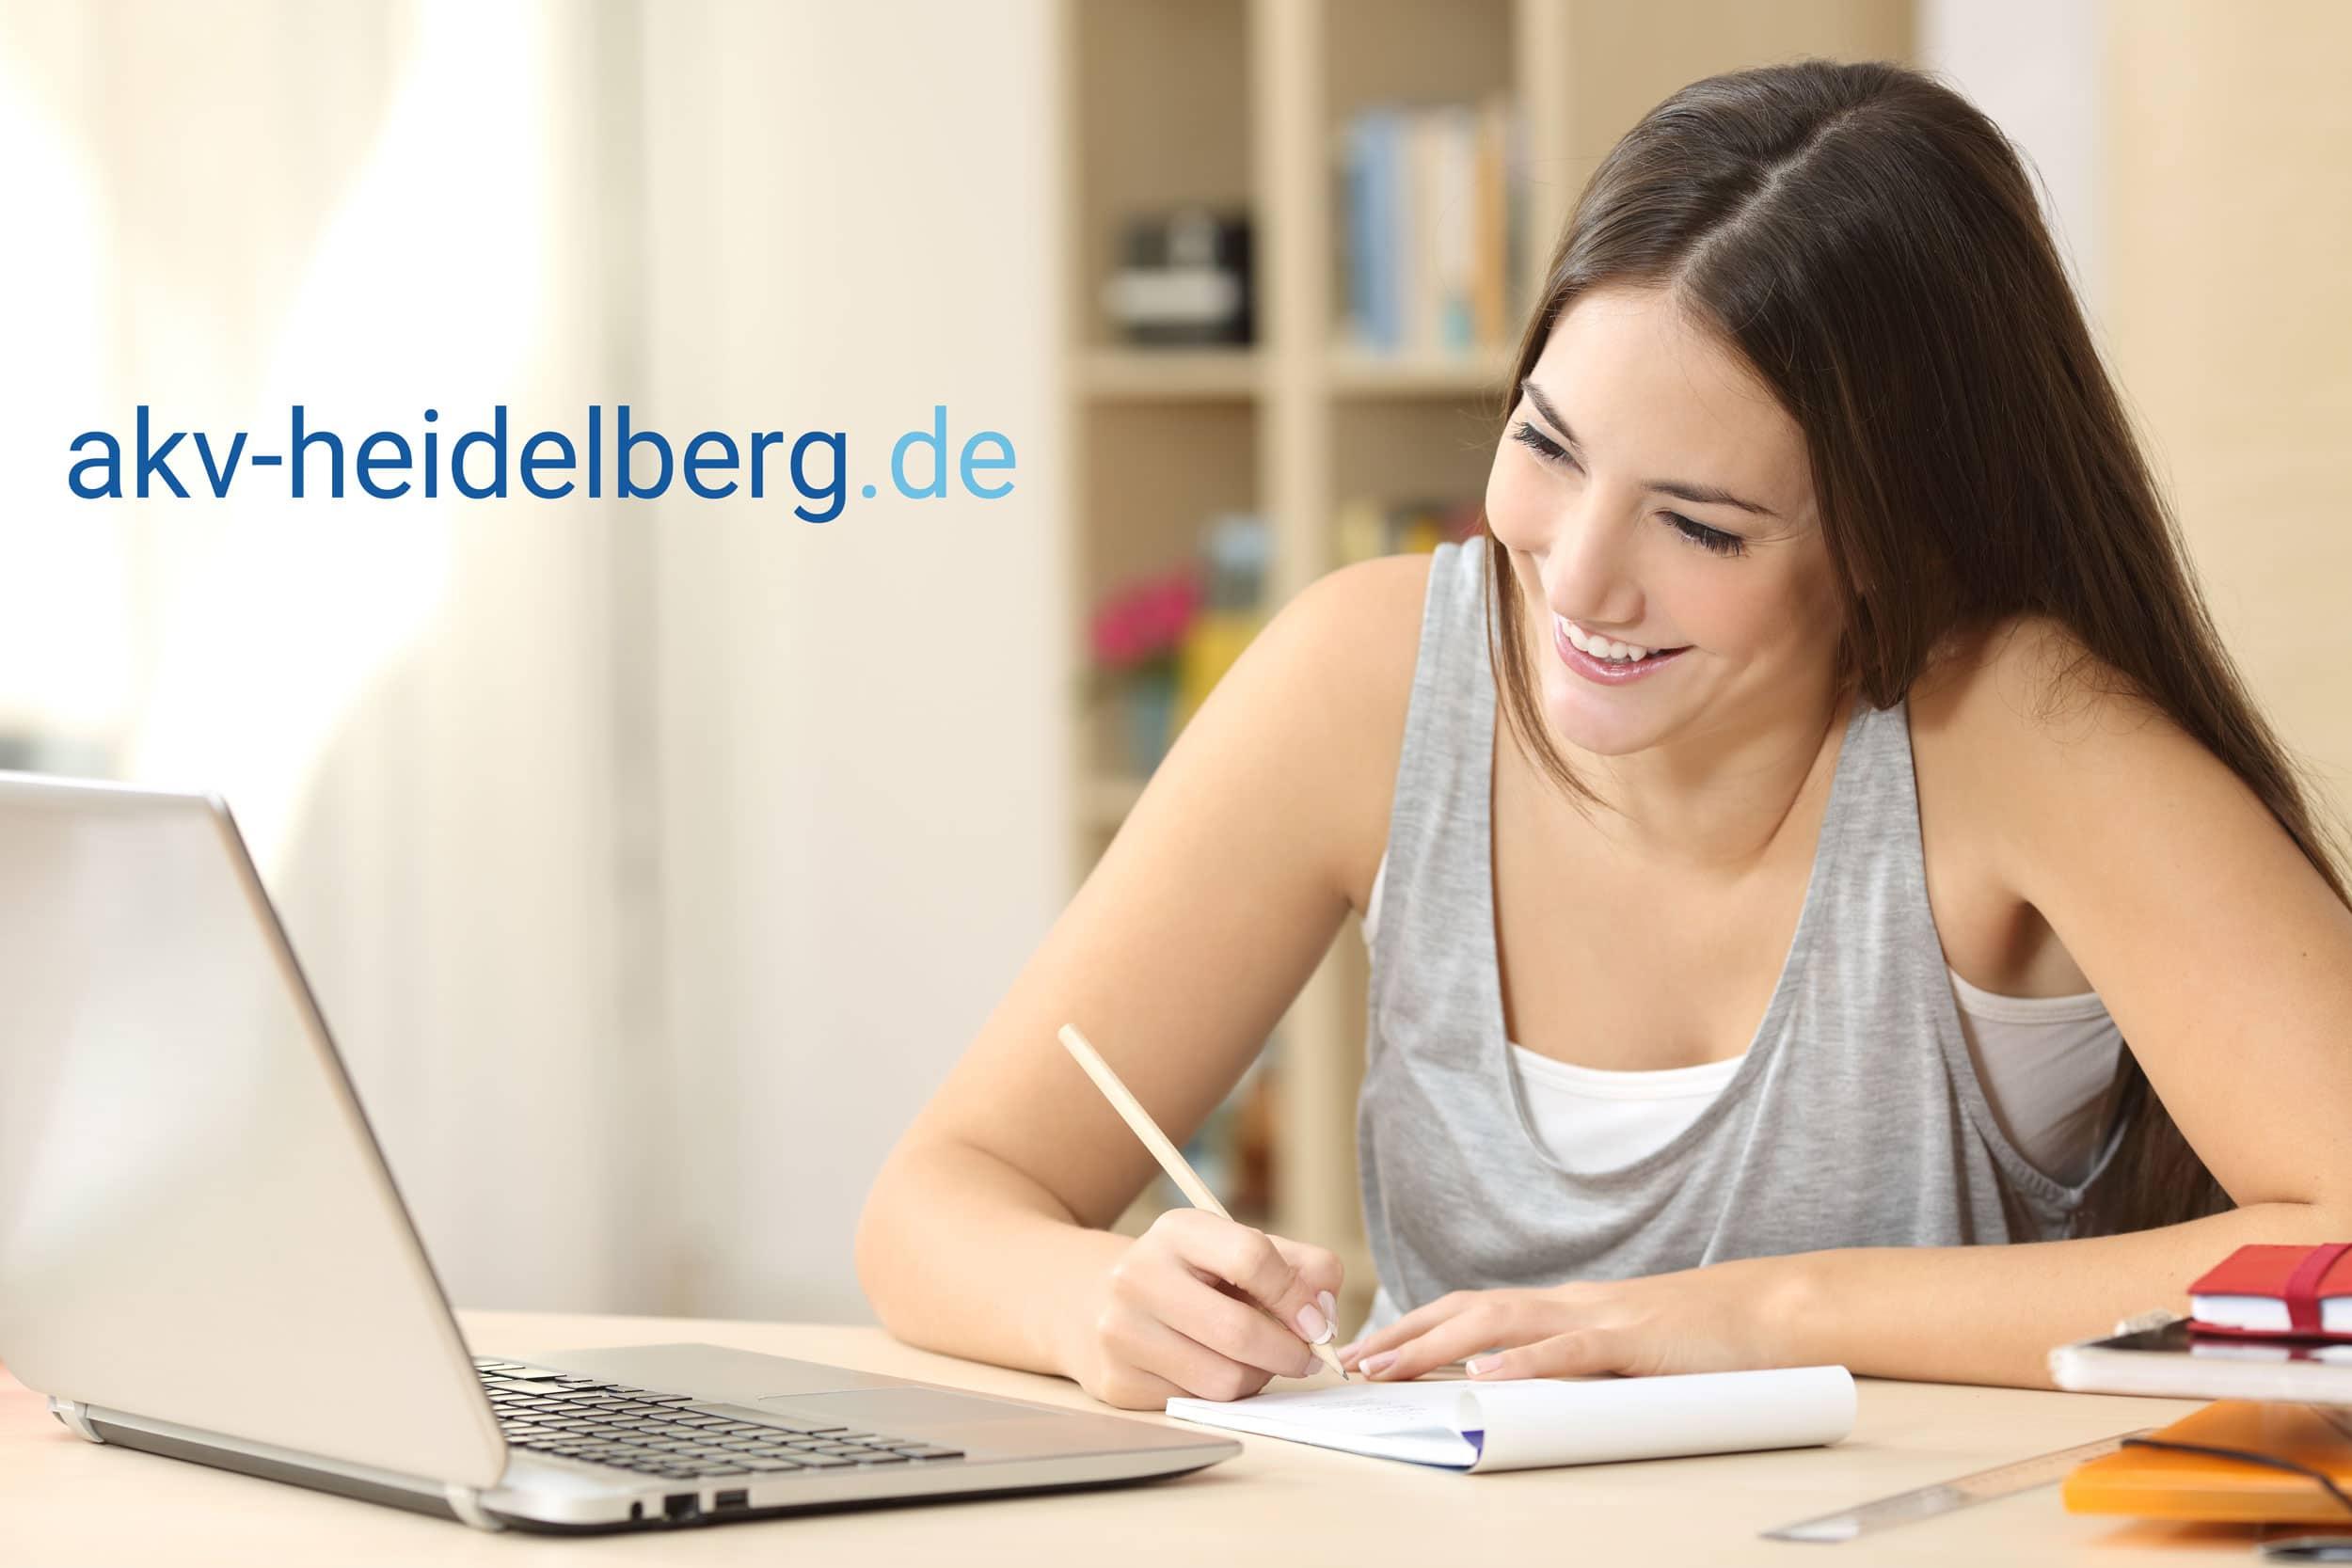 Onlineberatung mit AKV Heidelberg